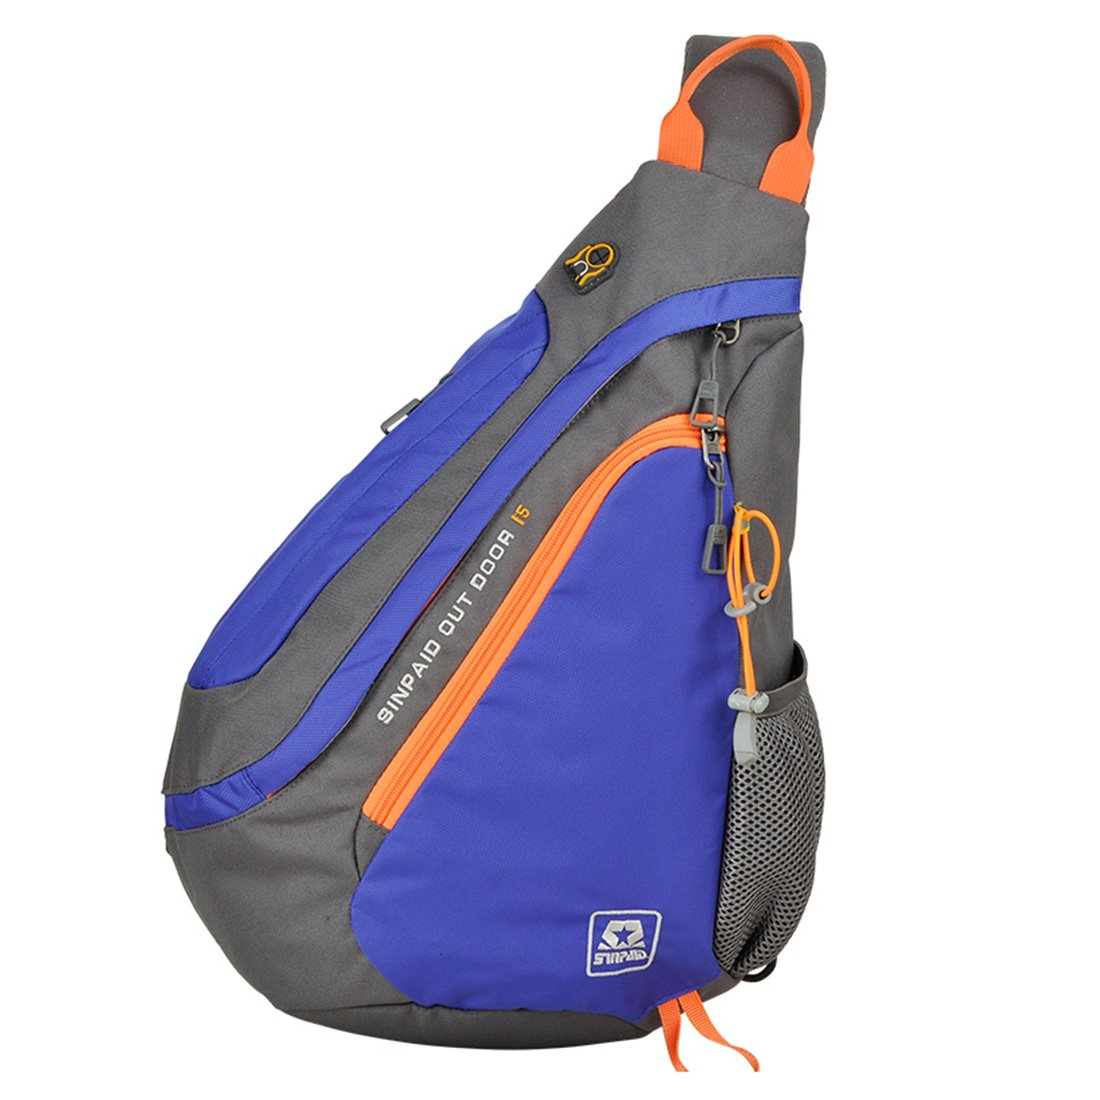 hot sale Sinpaid Dacron Chest Bag Crossbody Sling Bag Outdoor Sport Riding Chest Bag for Men Waterproof Anti-Splshing Bag 3Layer Hiking Cycling Bag Shoulder Bag